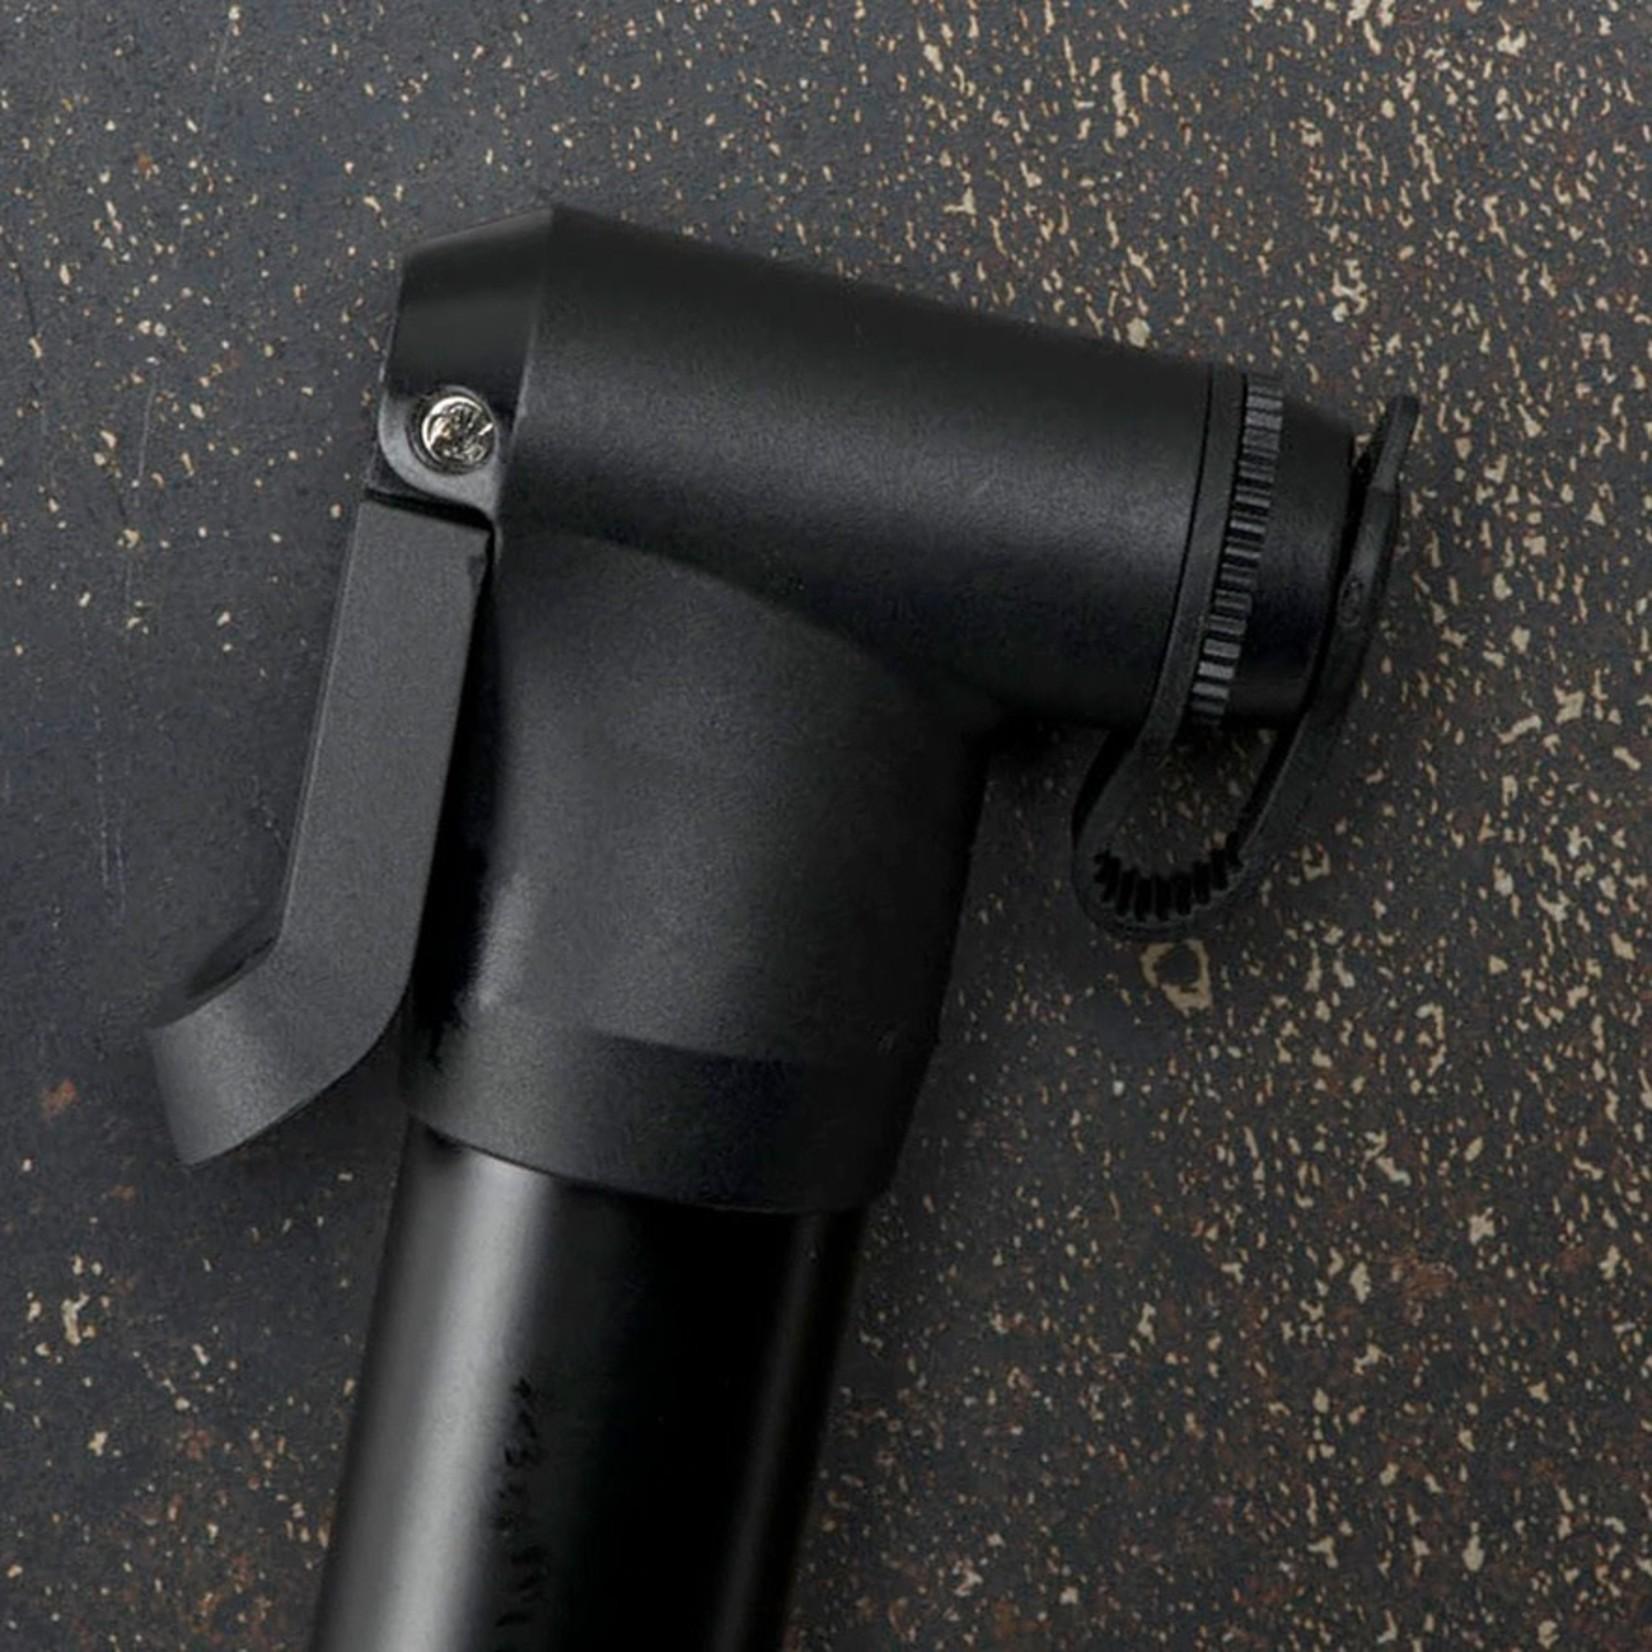 BLACKBURN BlackBurn, Mountain Anyvalve Mini Pump, Black